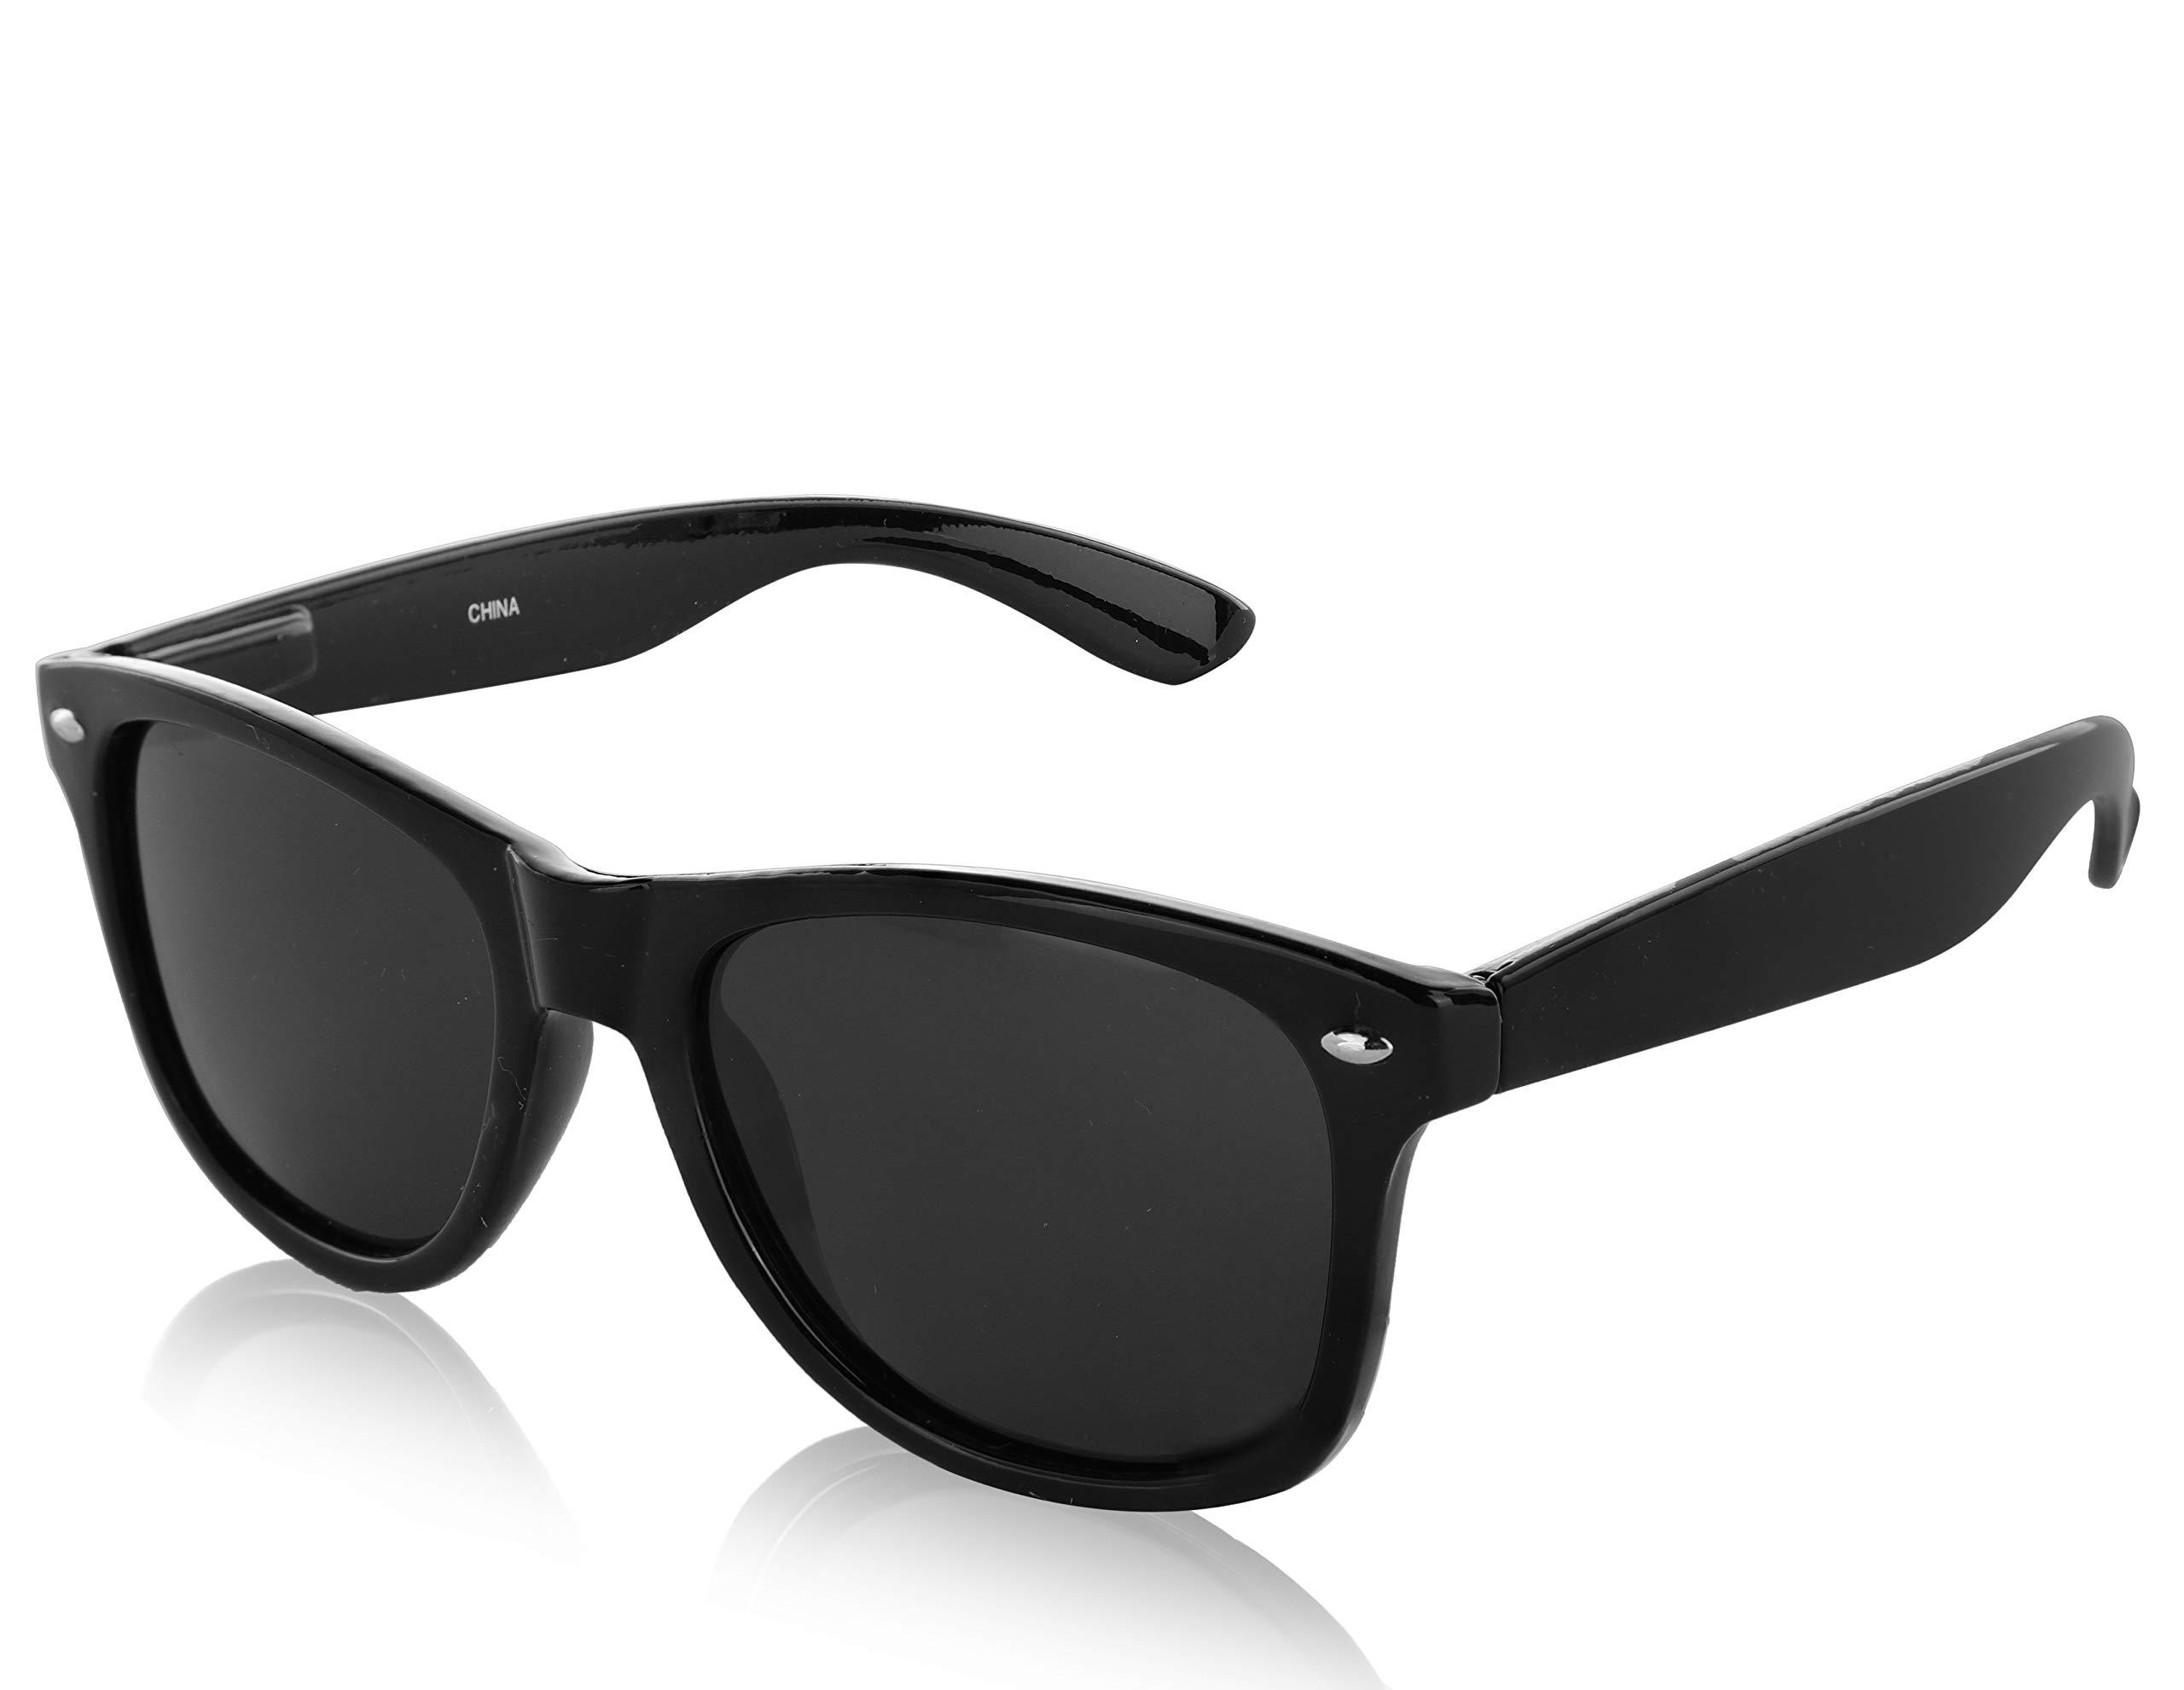 Sunny Pro Wayfarer Polarized Sunglasses Vintage Retro Designer Sun Glasses UV400 (G black)